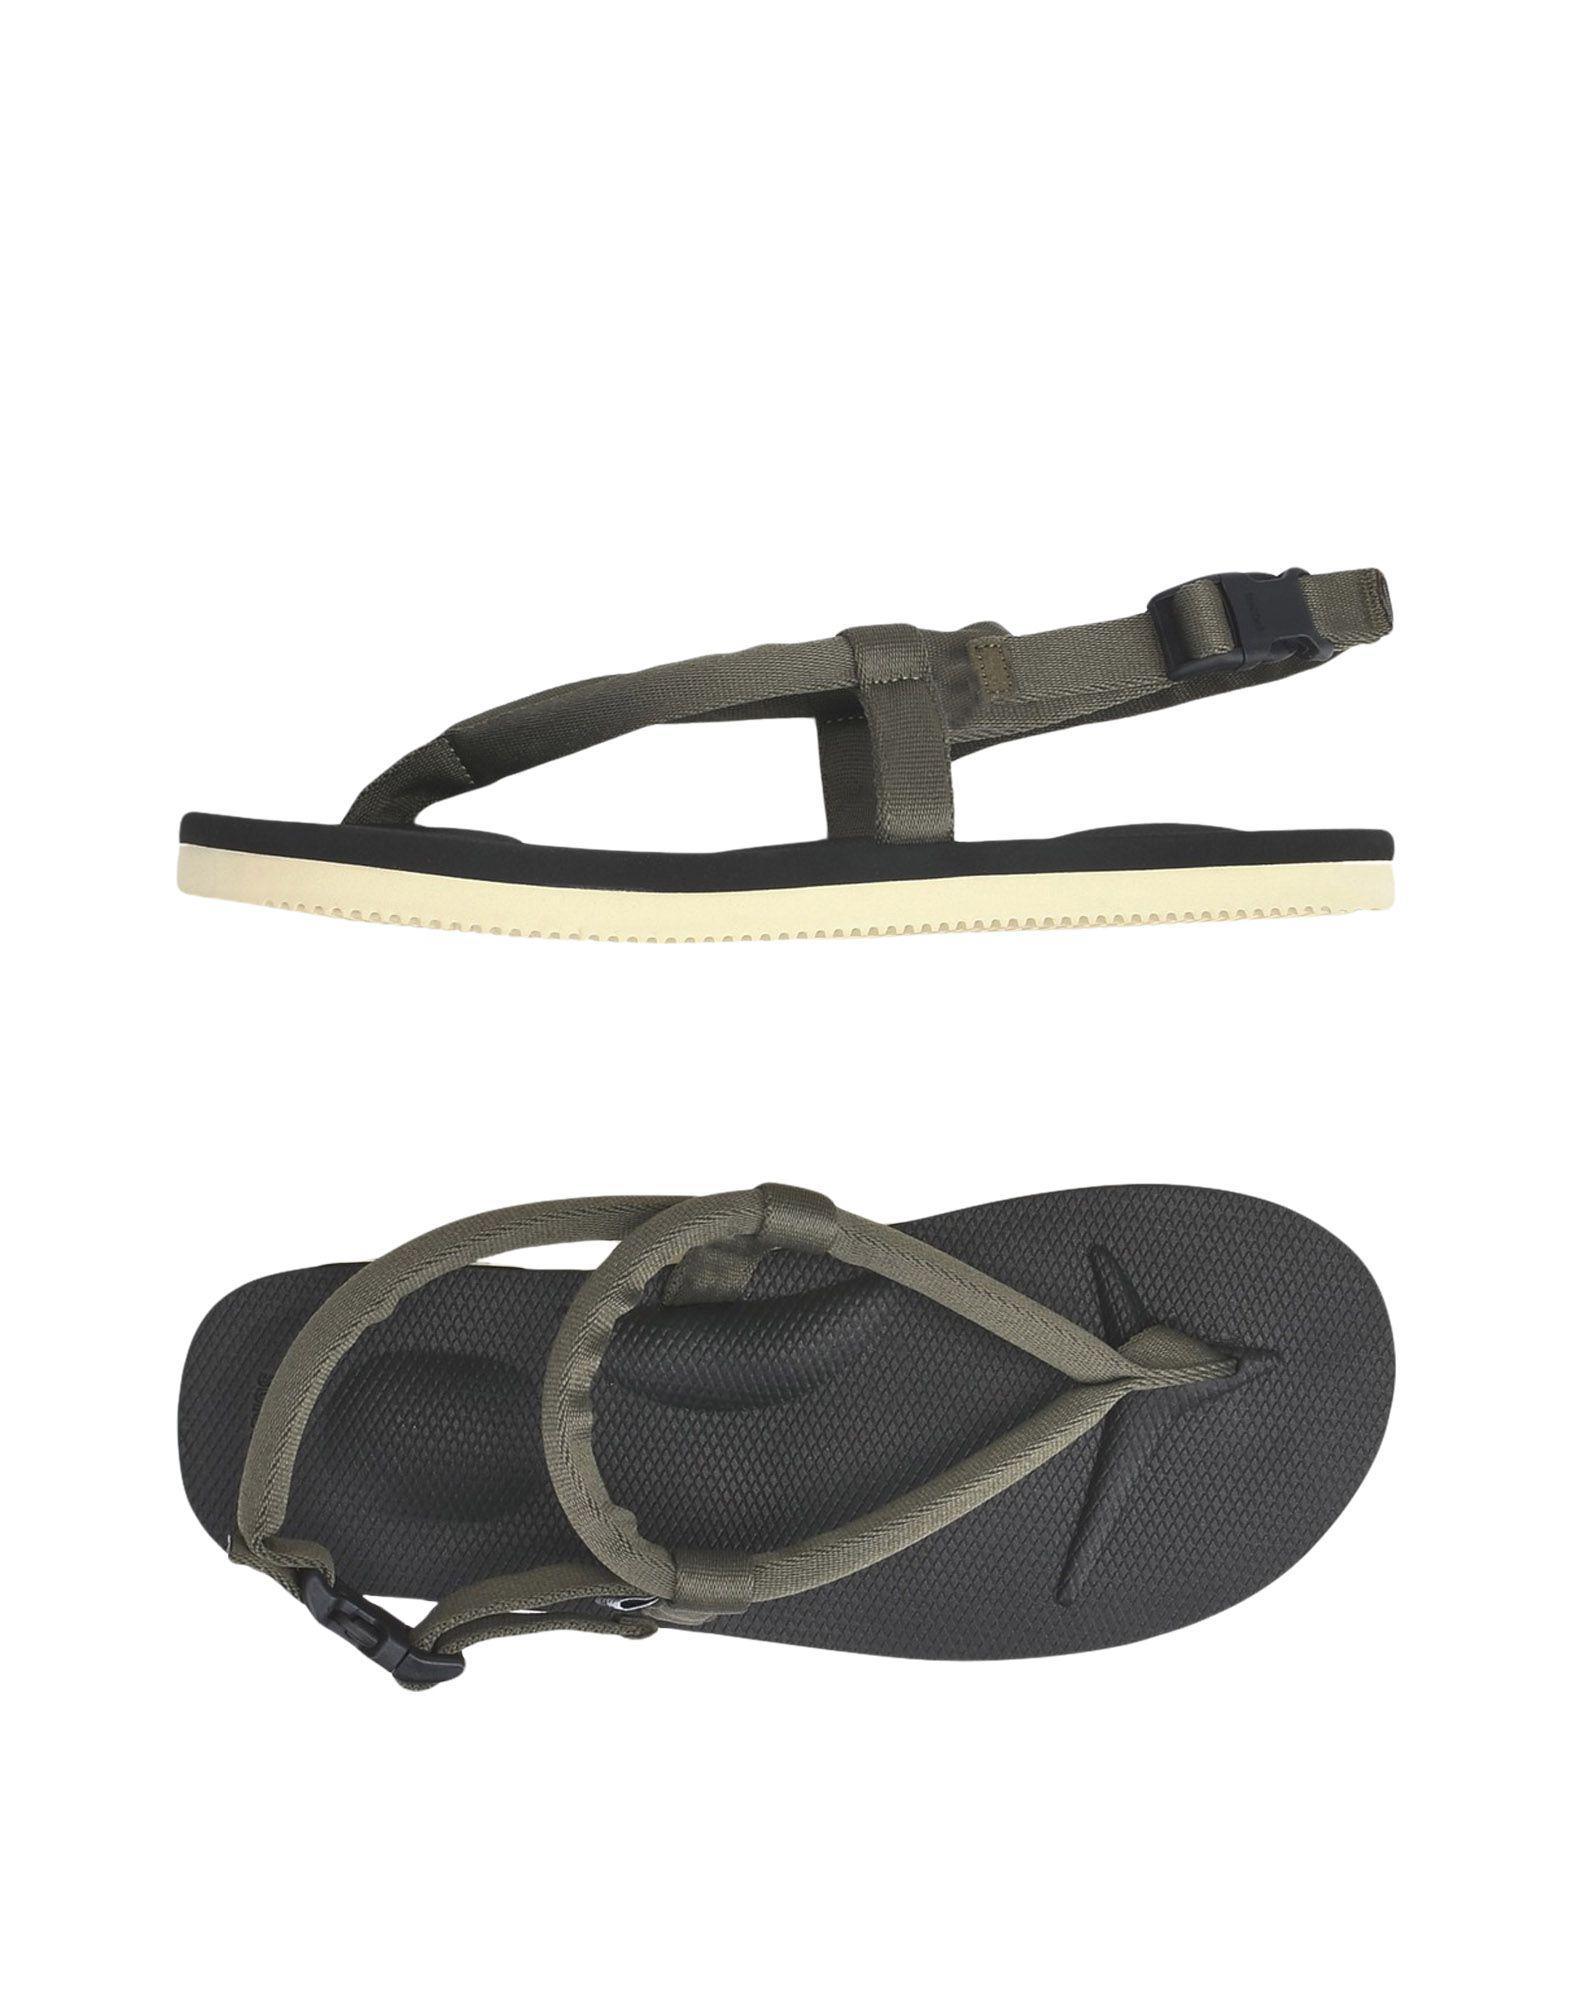 900a0b07cb58 Suicoke Toe Strap Sandals in Green for Men - Lyst